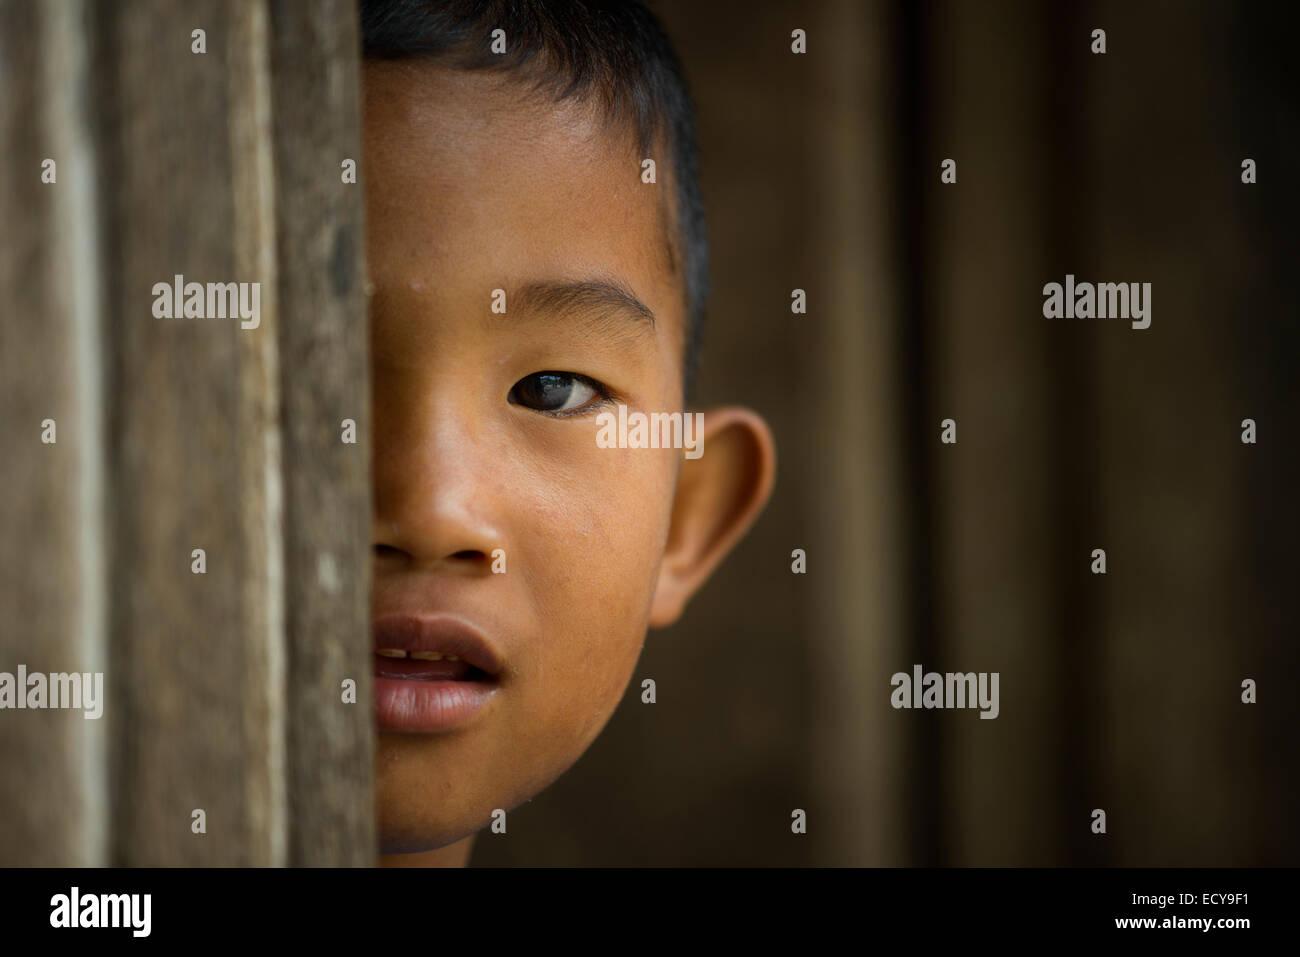 Igorot boy of the Cordillera, Northern Luzon, Phllippines - Stock Image